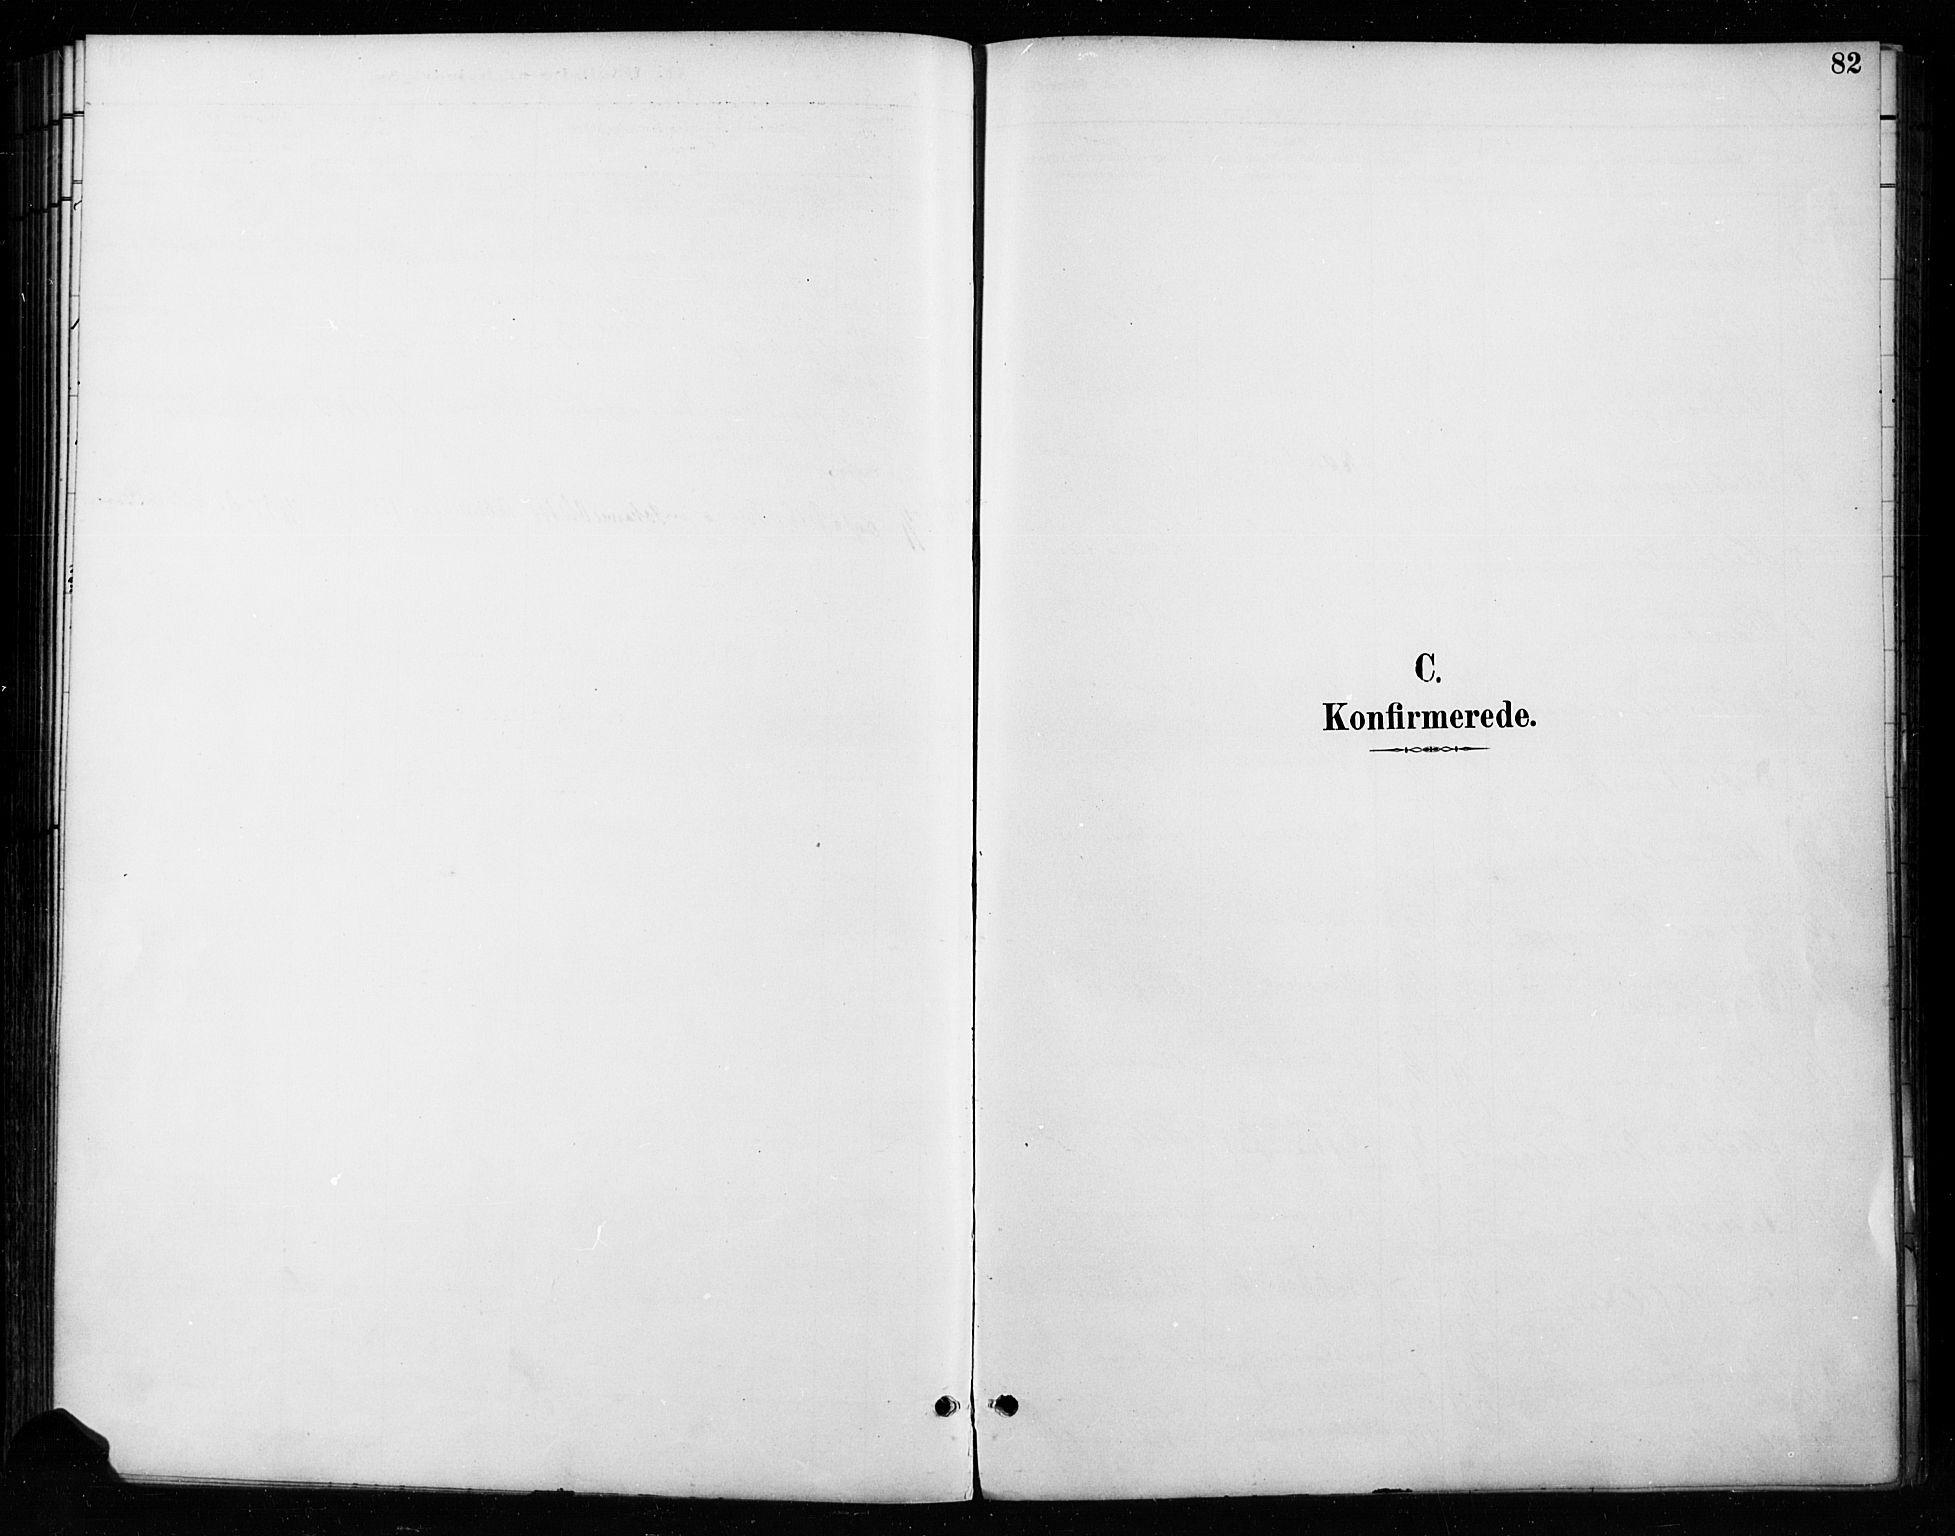 SAH, Gran prestekontor, Ministerialbok nr. 18, 1889-1899, s. 82